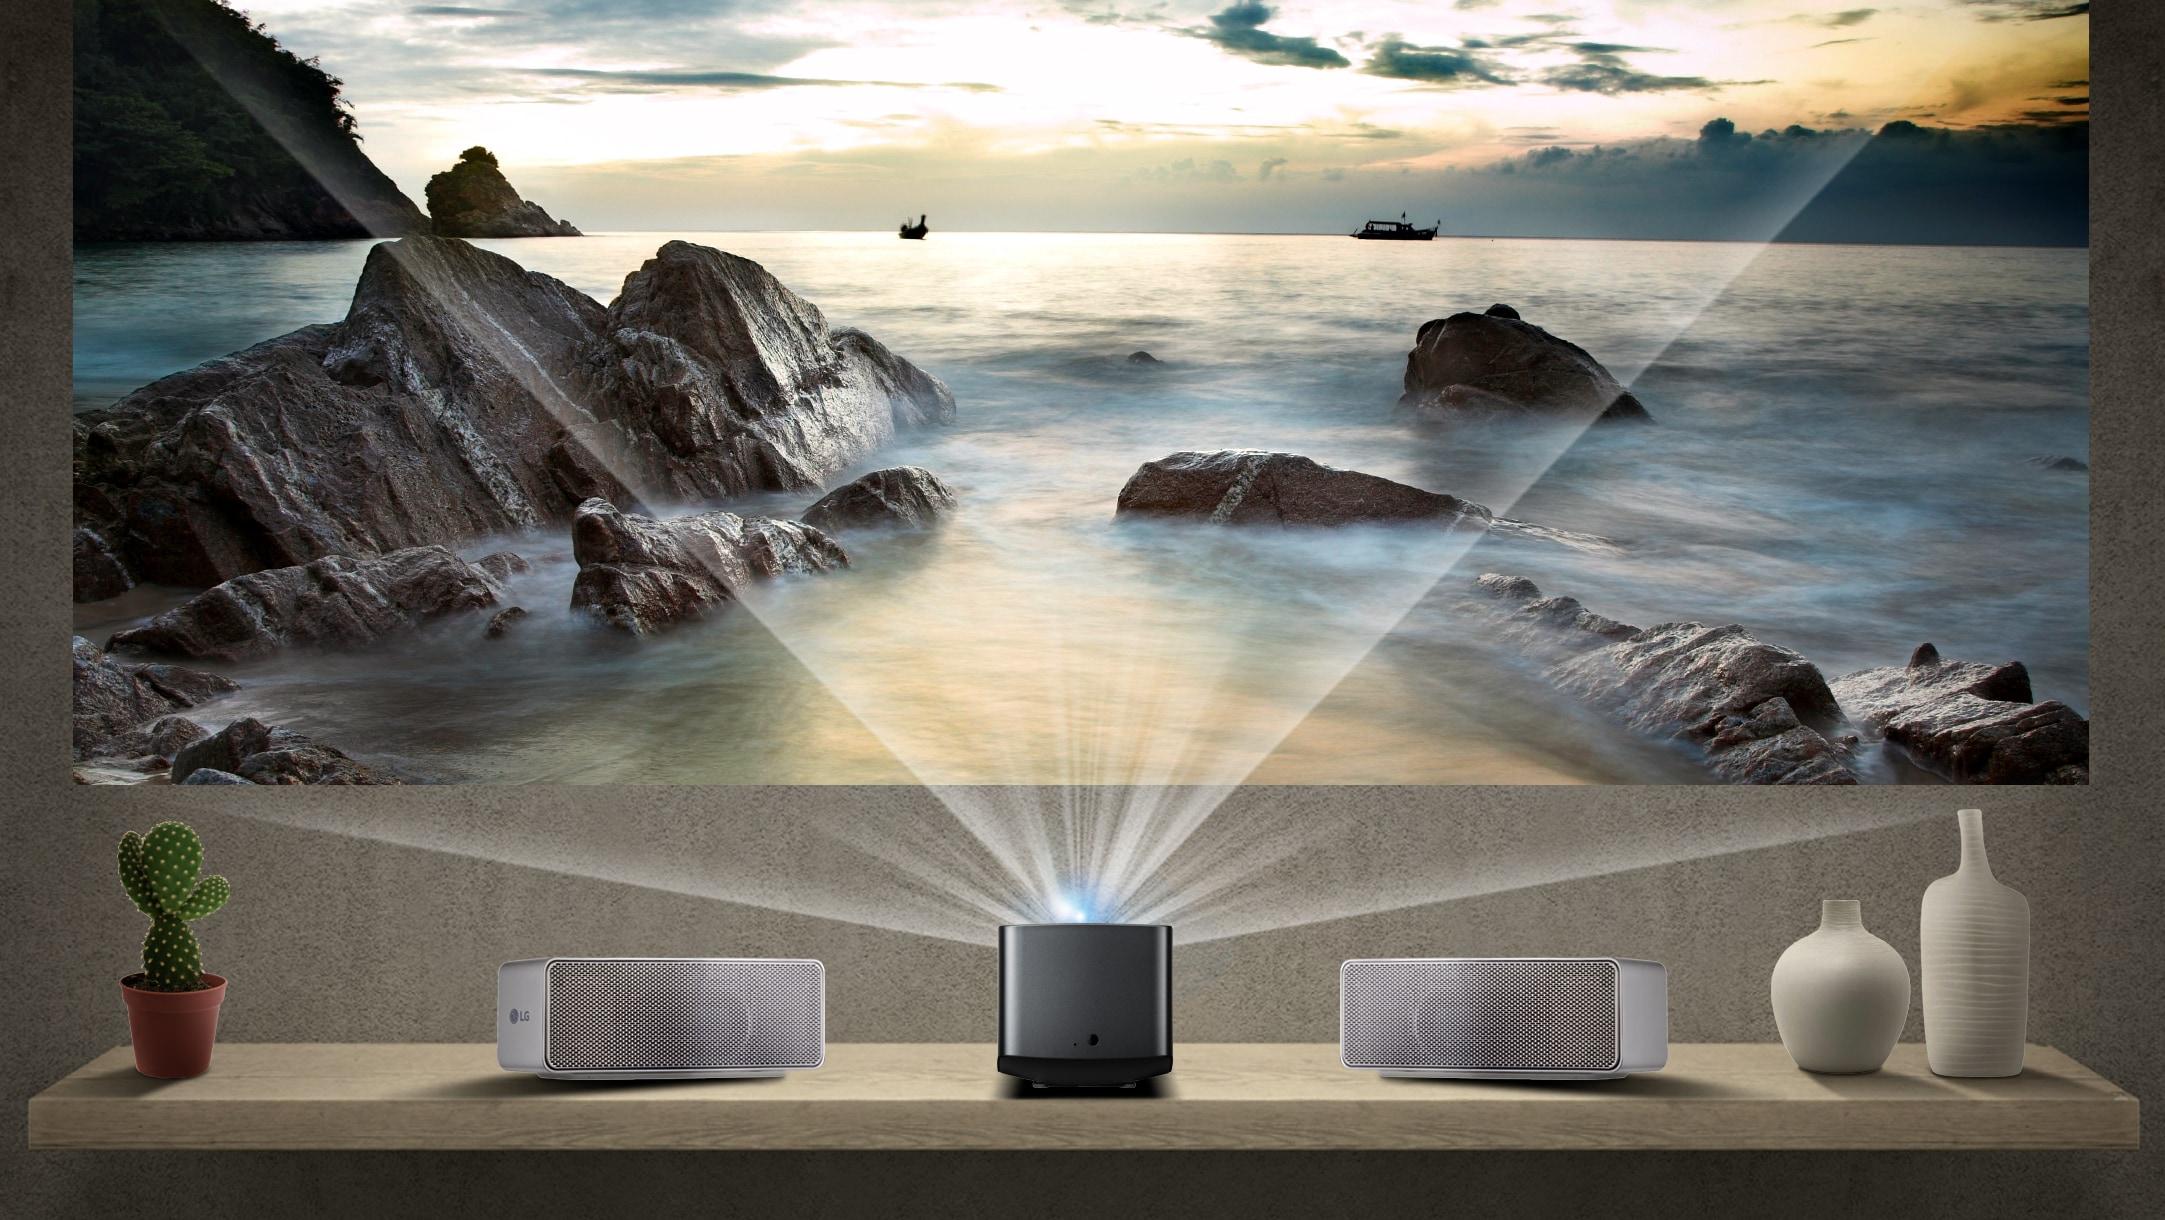 Designed for harmonic interior